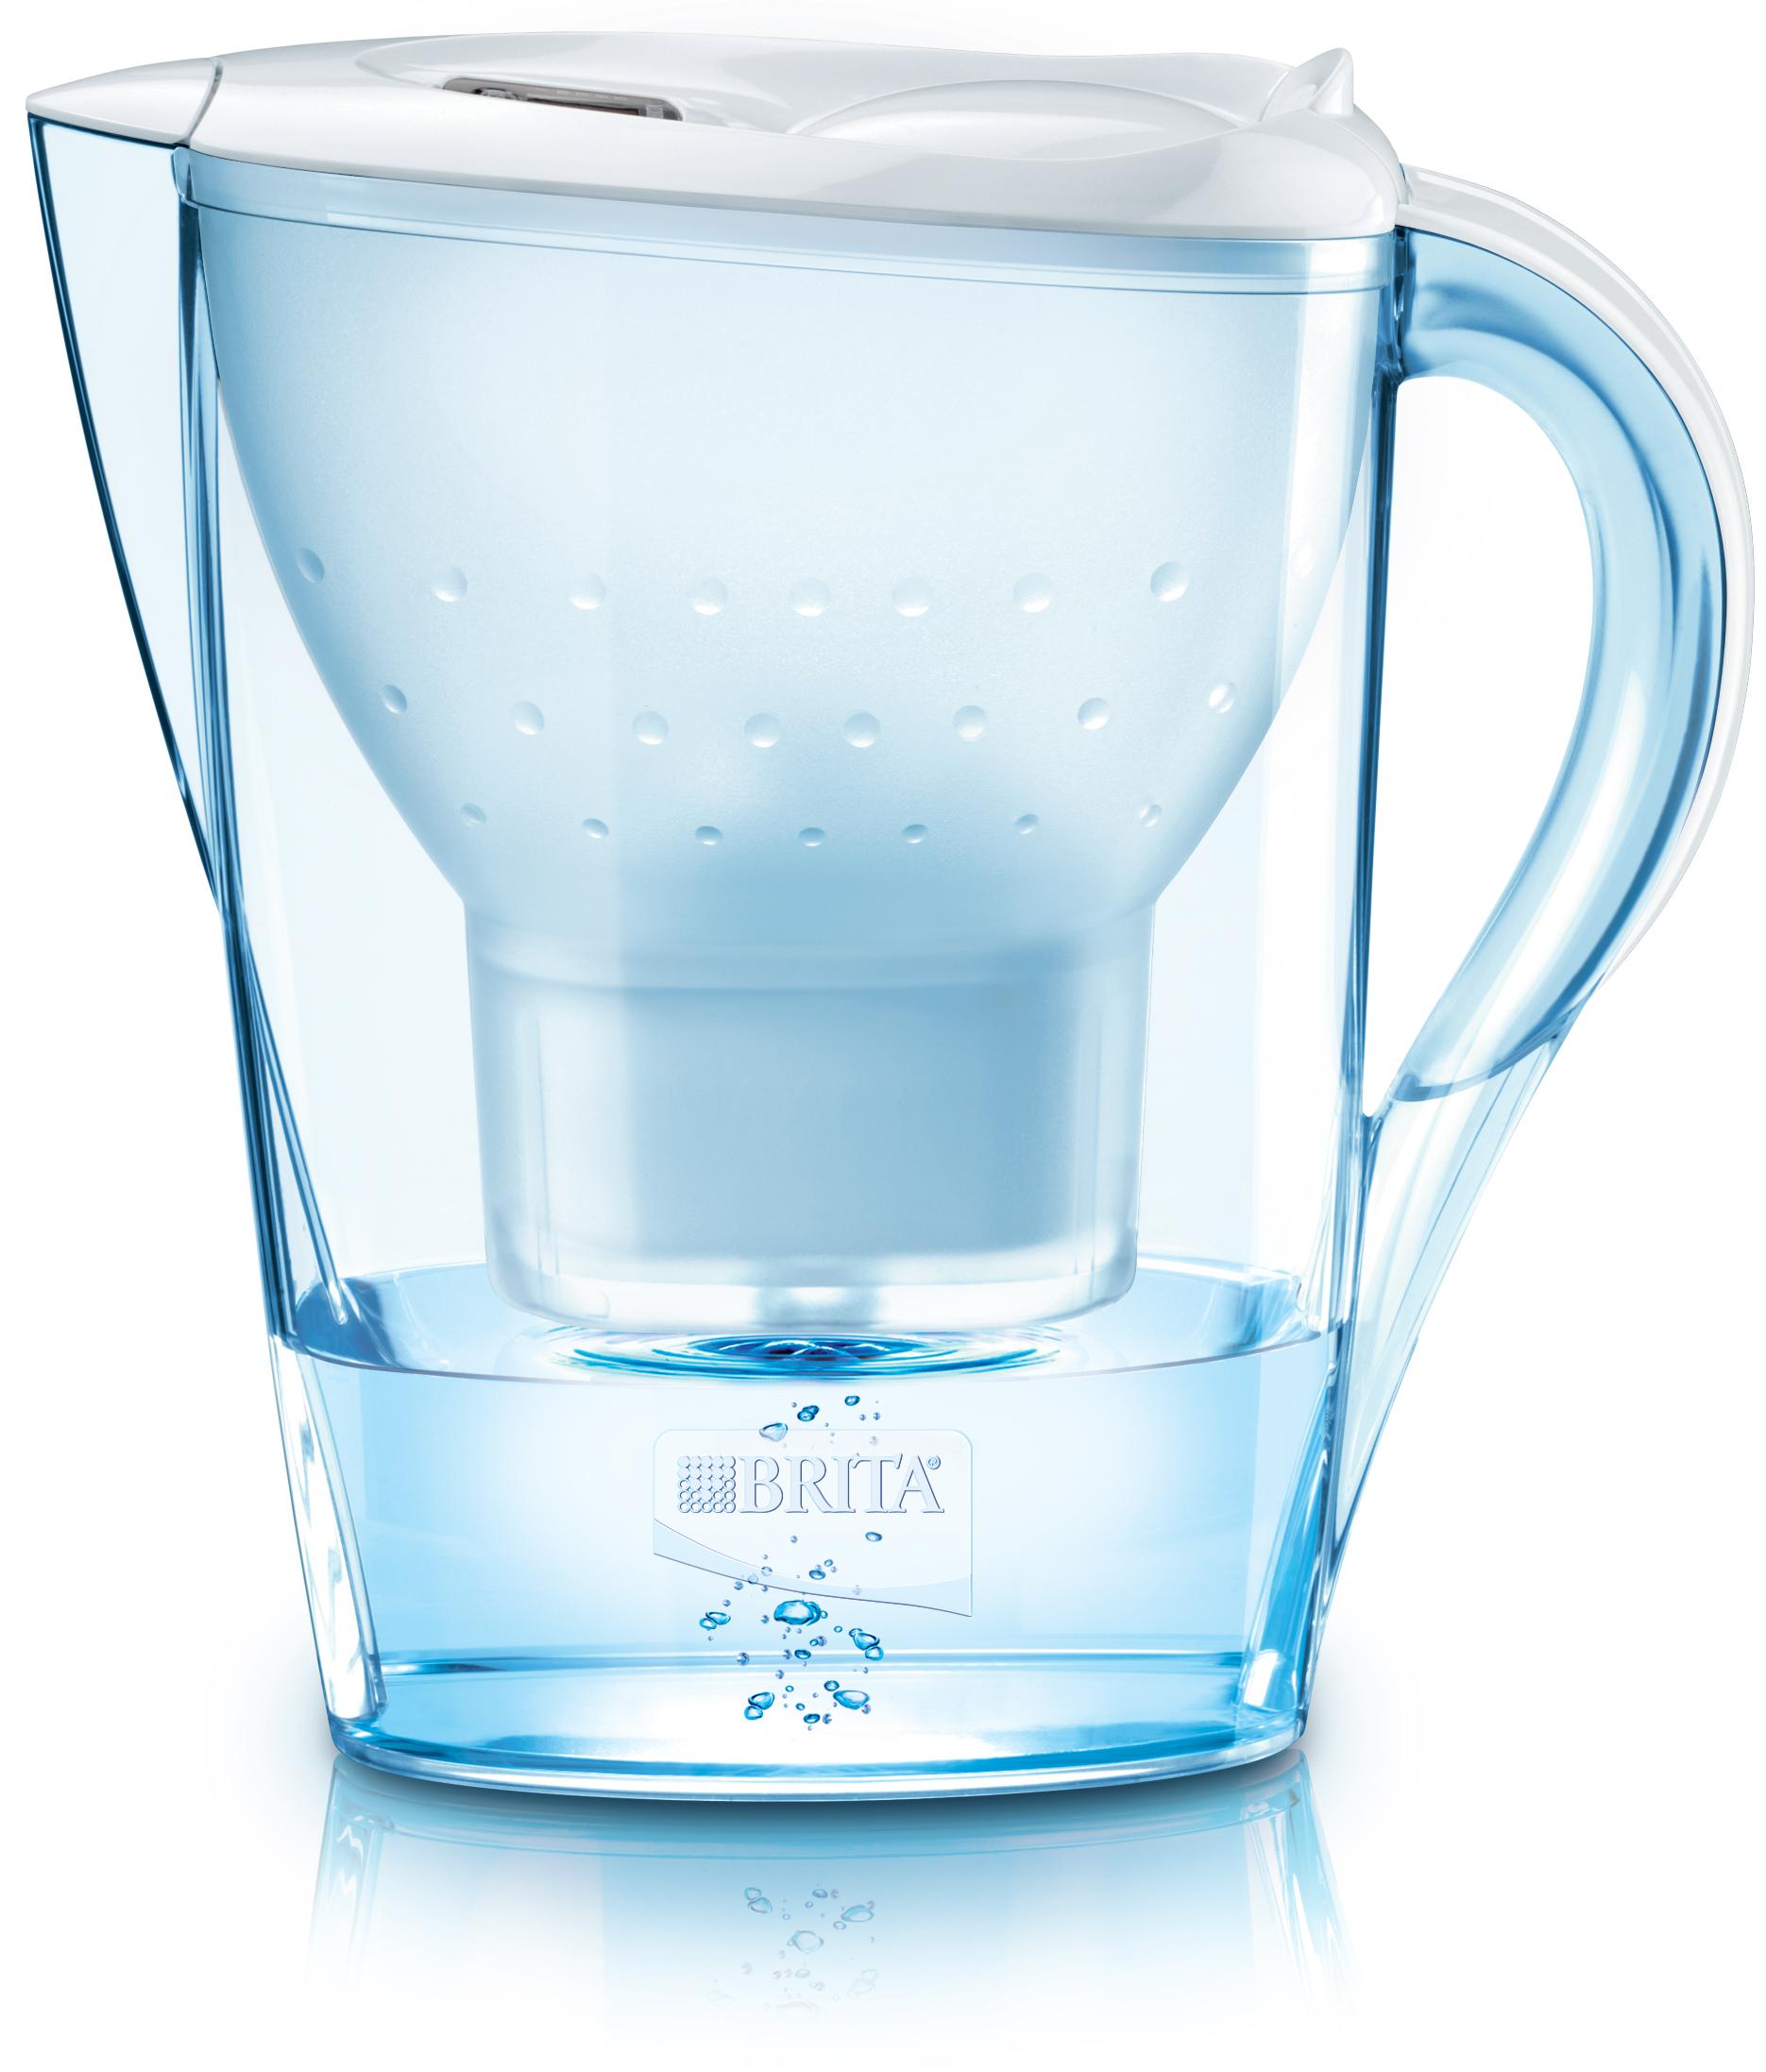 Filtrační konvice Marella Cool Memo 2,4L bílá, BRITA